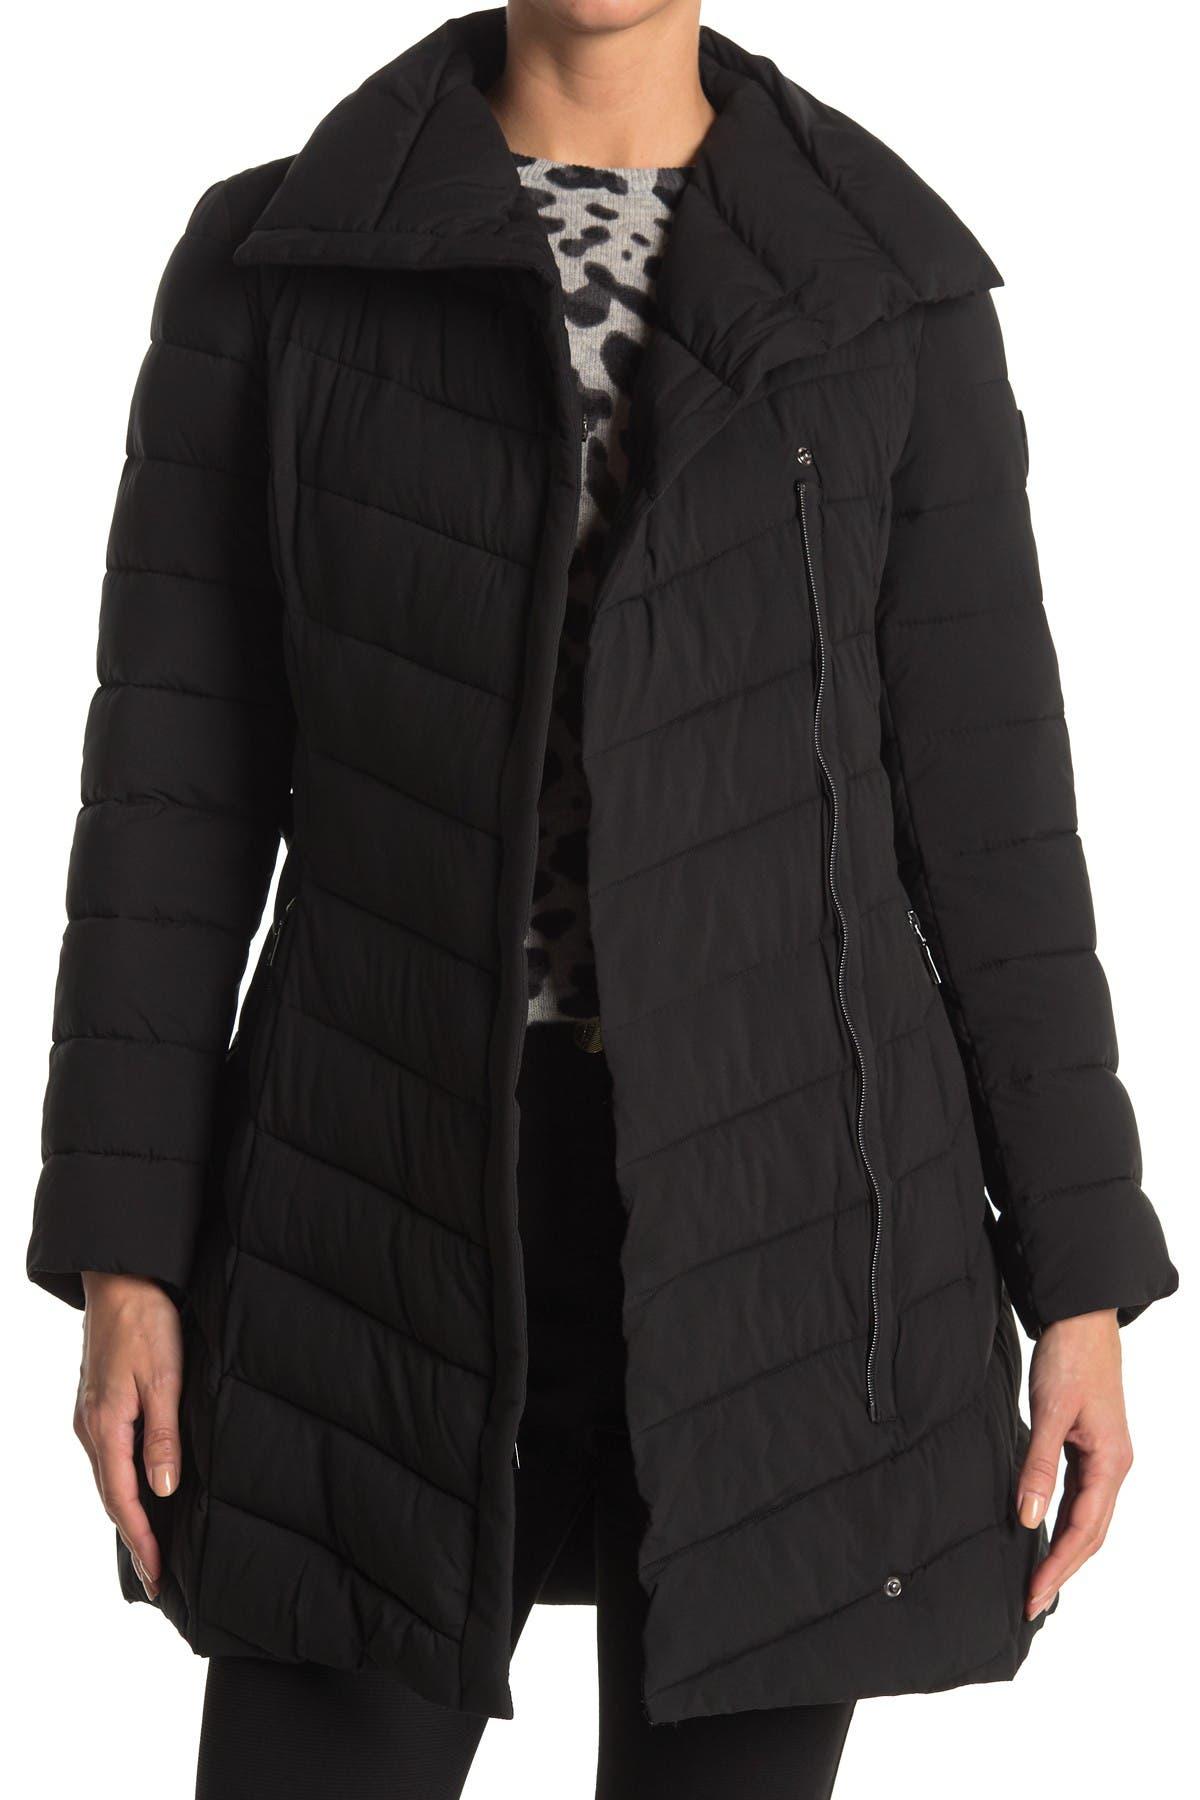 Image of Tahari Kim Asymmetrical Zip Puffer Jacket